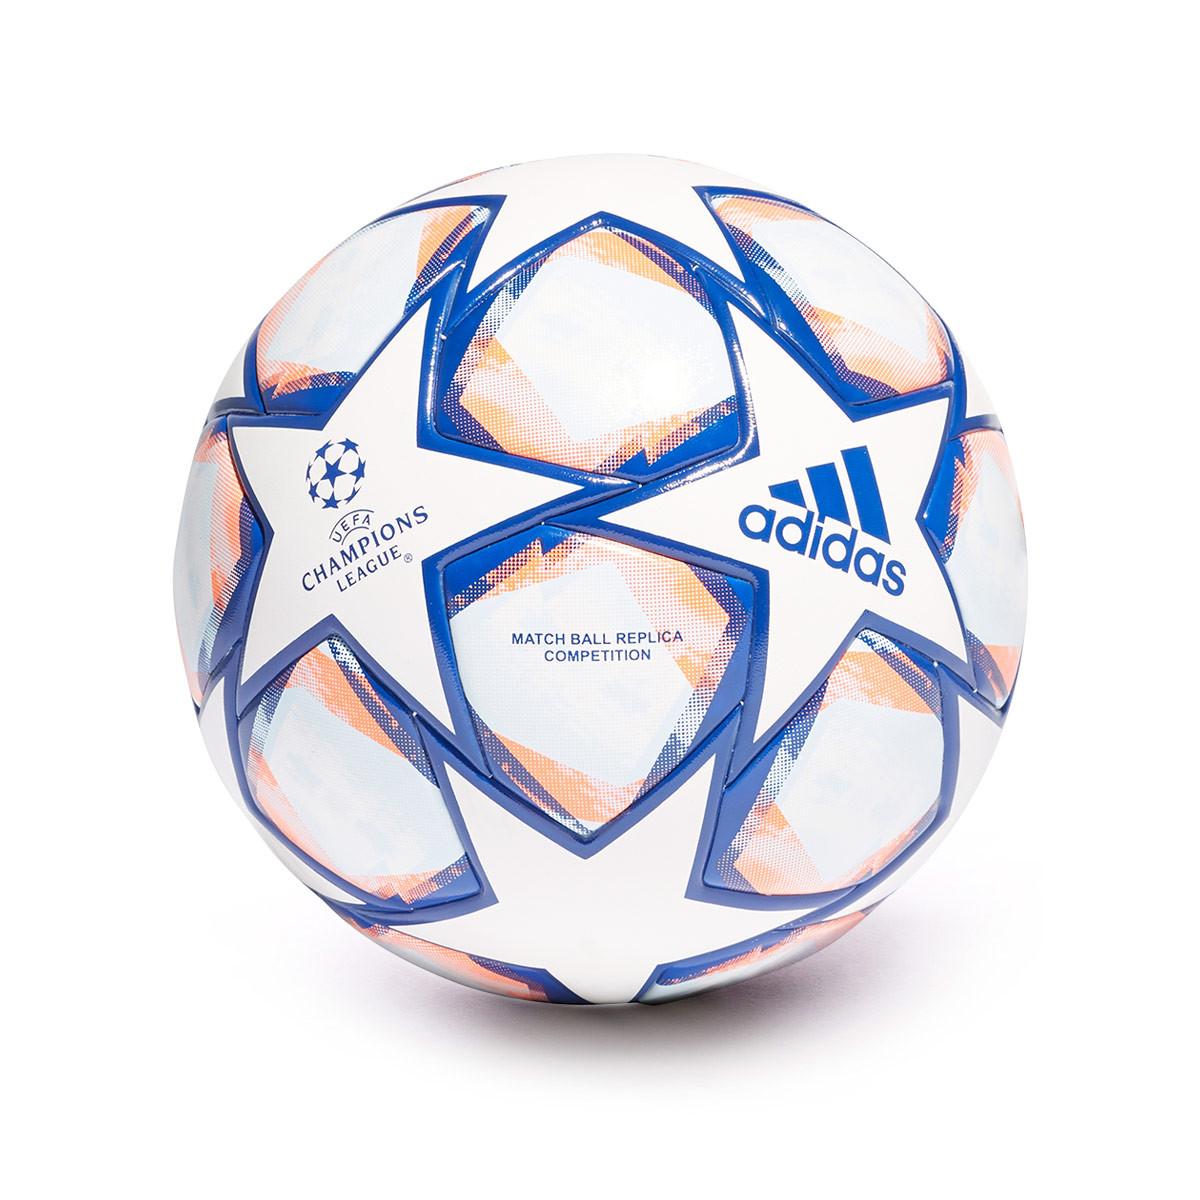 Molesto Controlar difícil de complacer  Balón adidas Finale 20 Competition Champions League White-Team royal  blue-Signal coral-Sky tint - Tienda de fútbol Fútbol Emotion